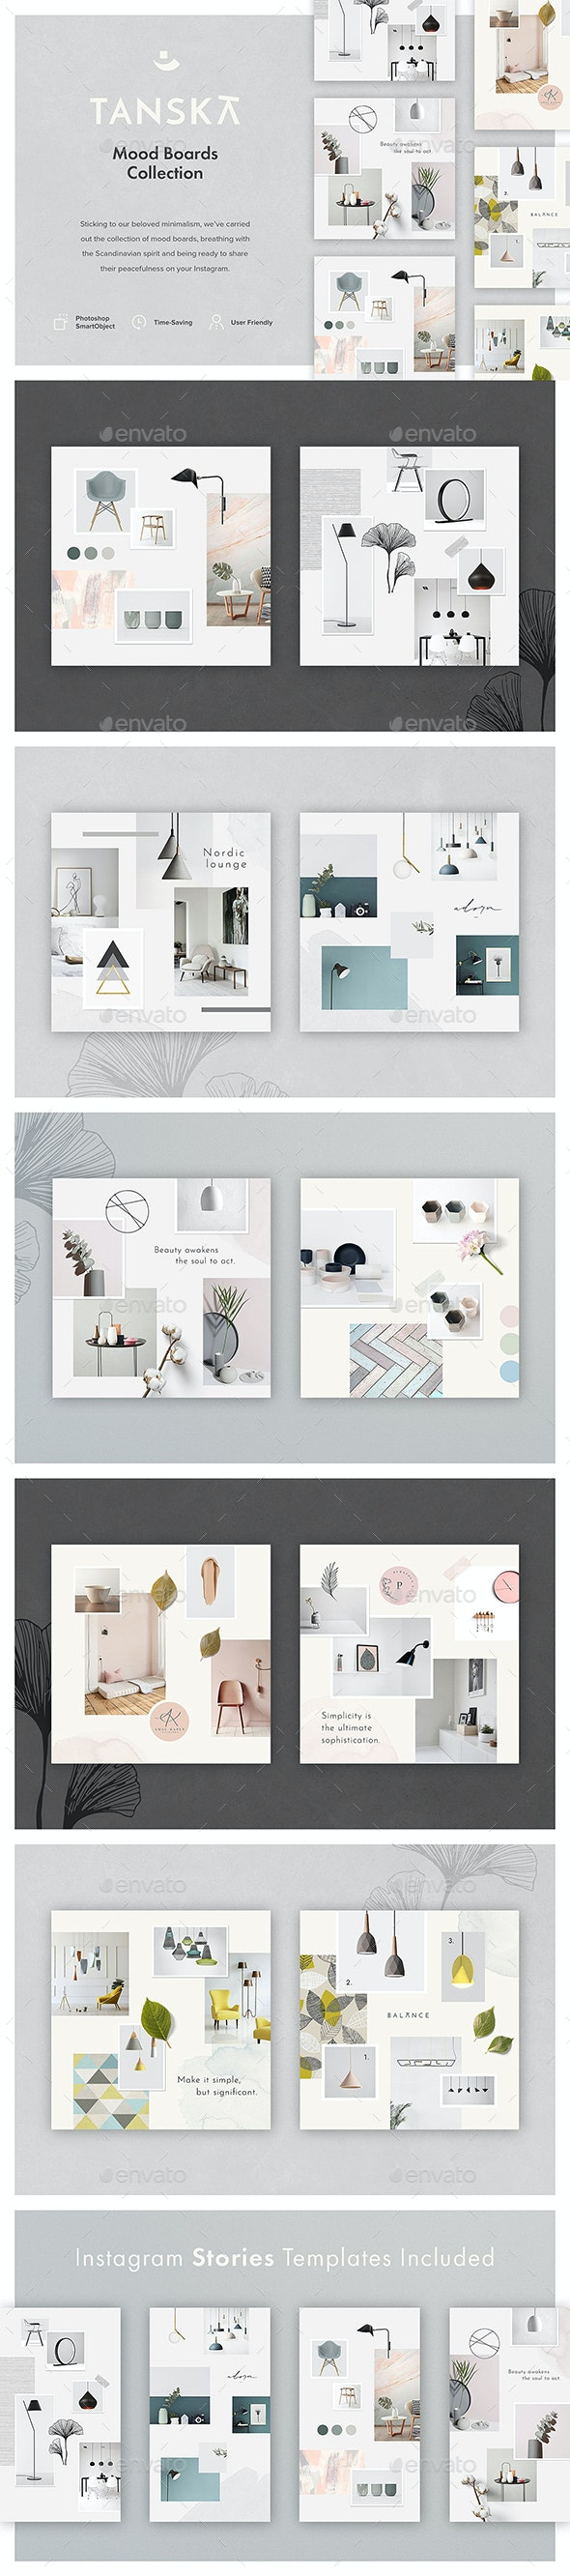 Tanska Mood Boards Collection - Social Media Web Elements